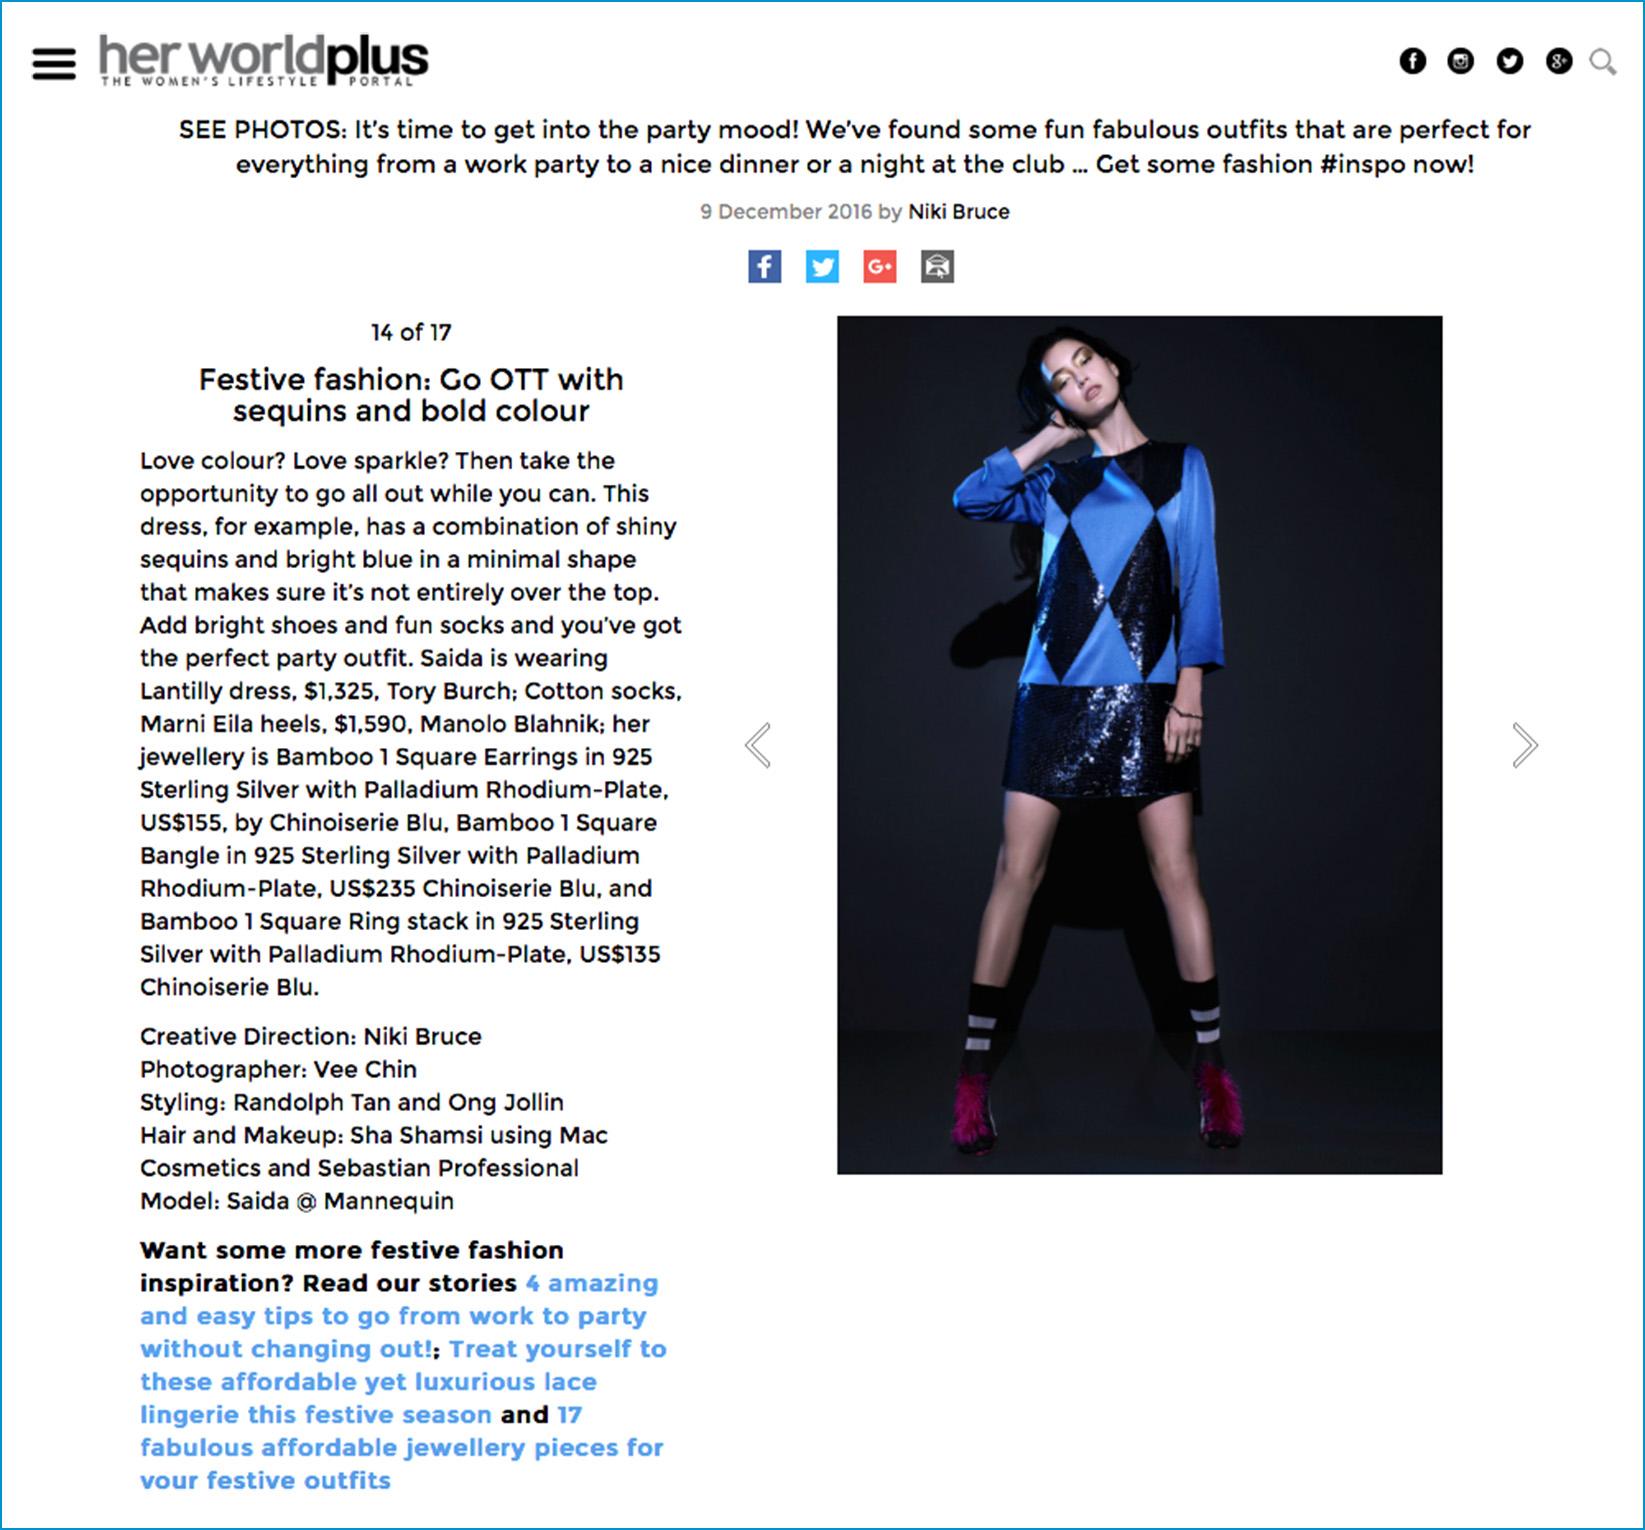 Chinoiserie Blu_Festive Spread 14of17-herworldplus.com (9 Dec)